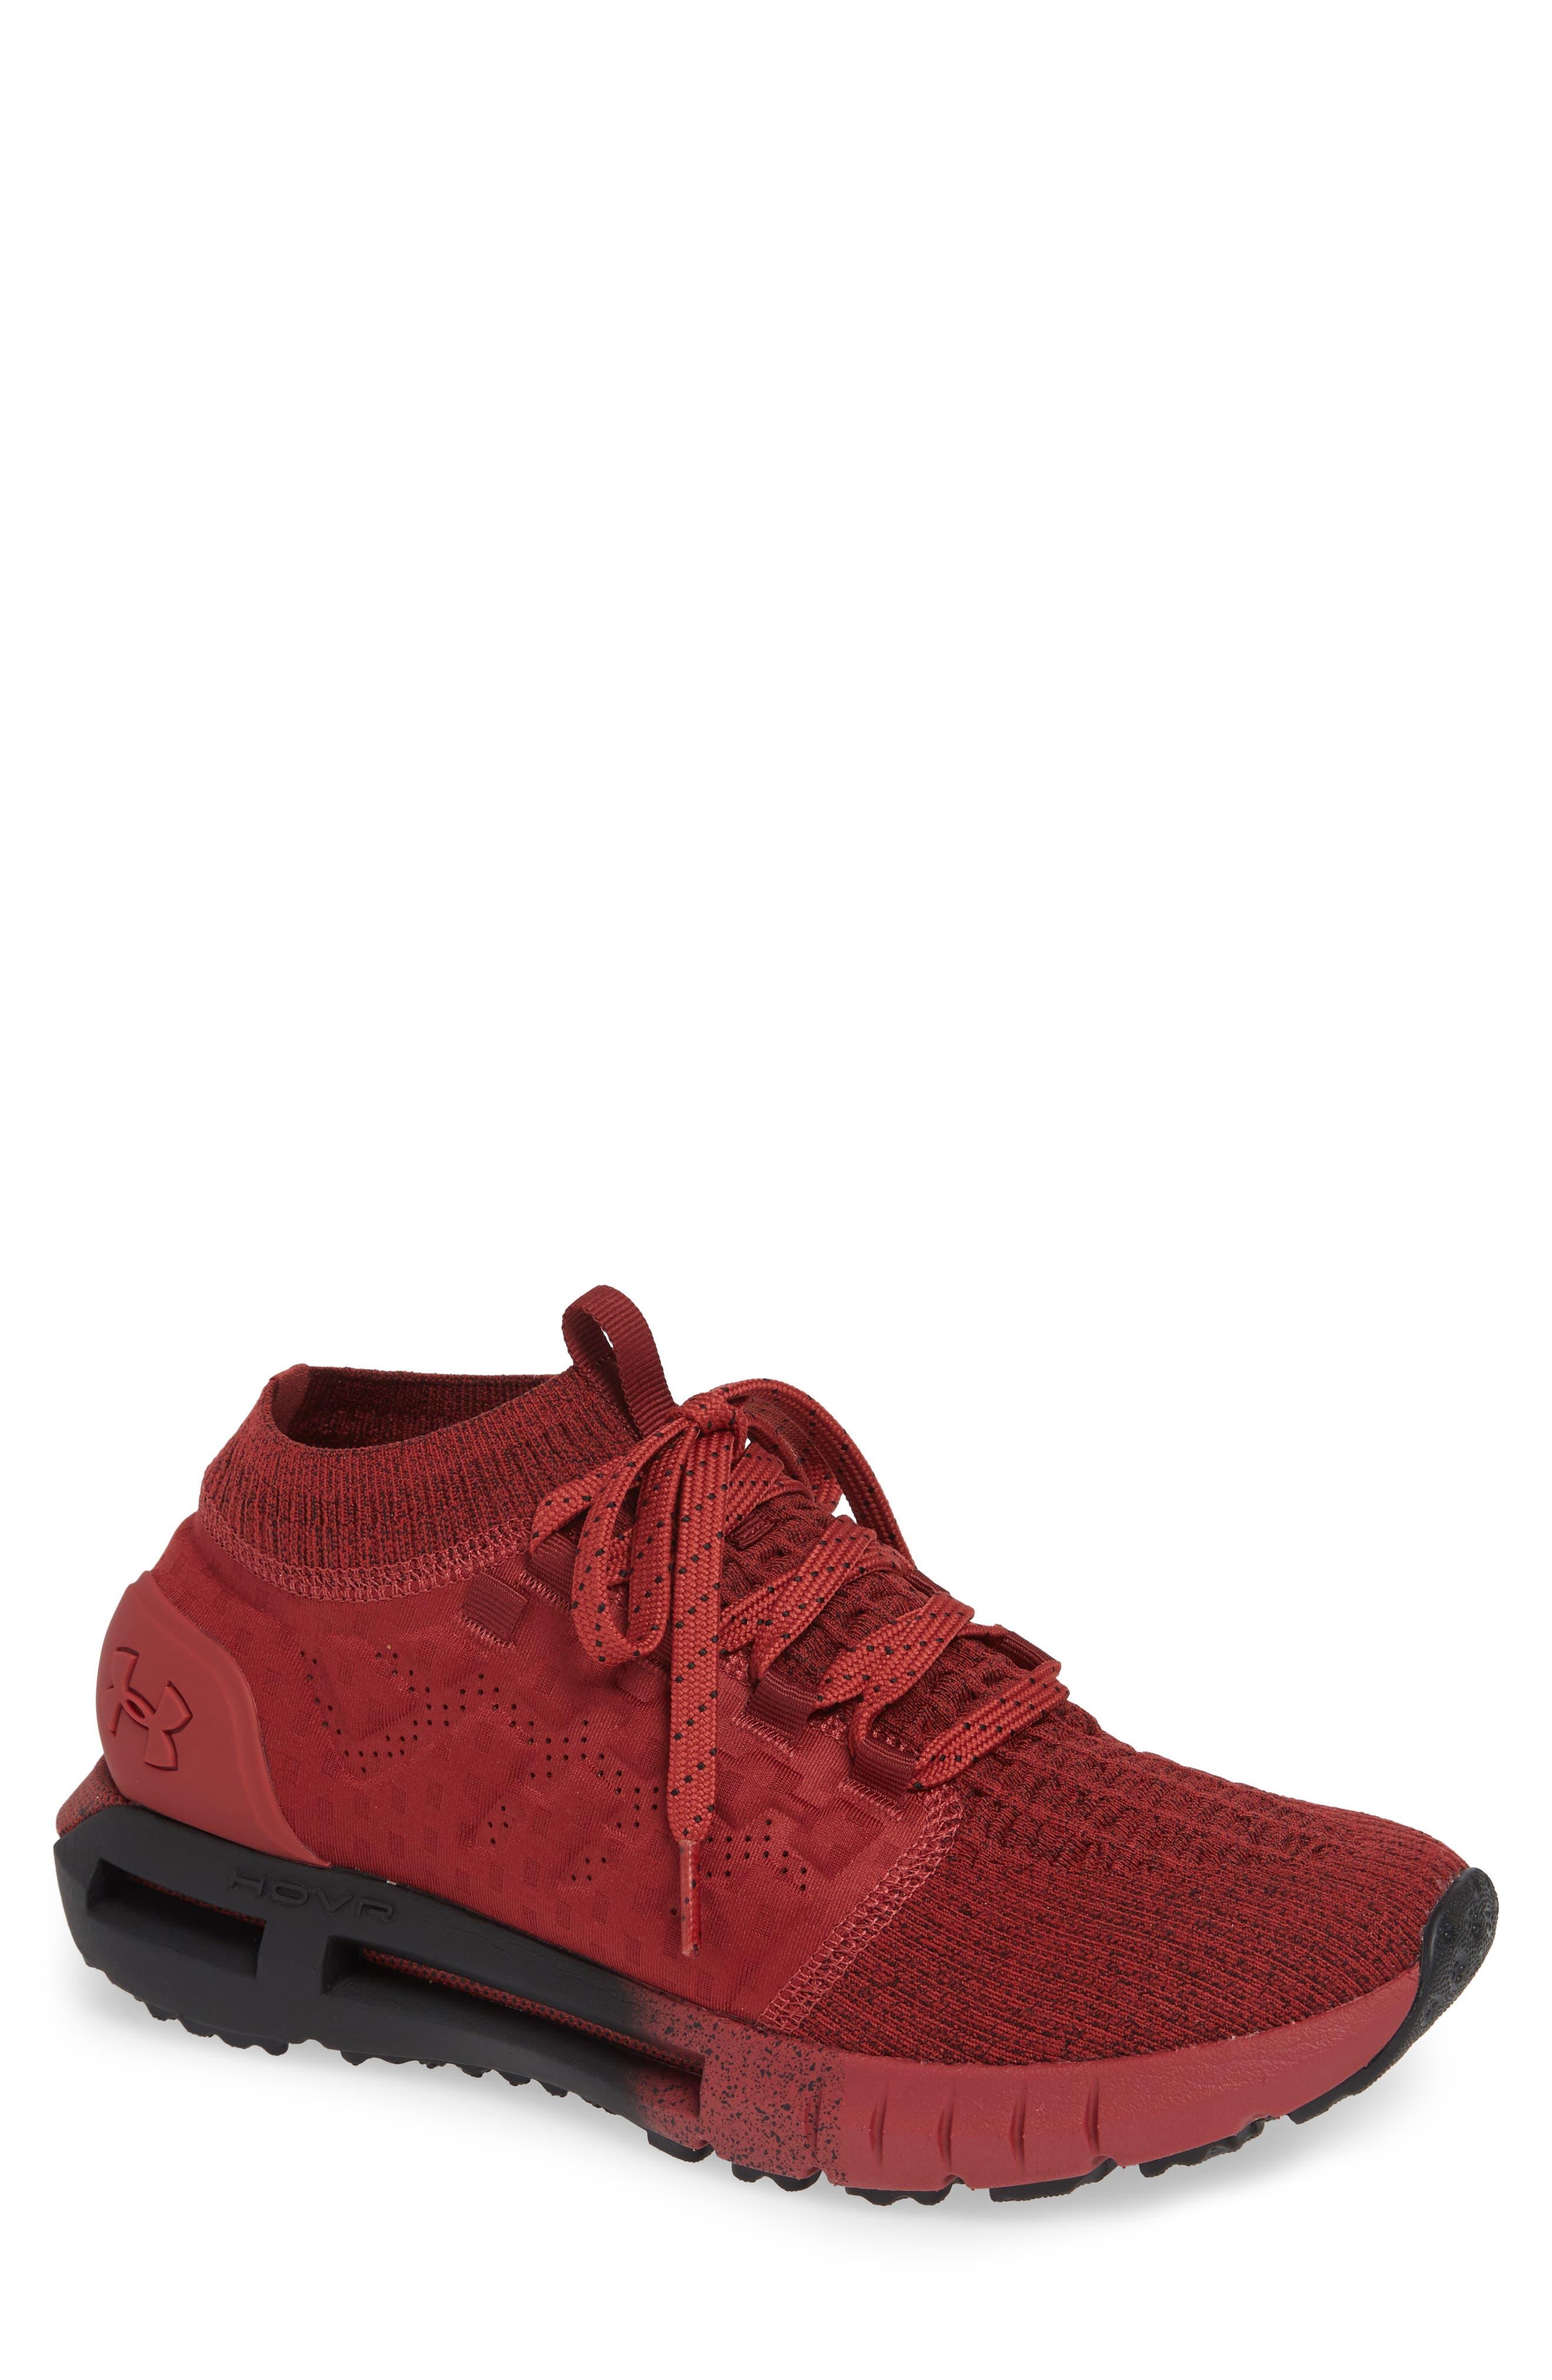 UNDER ARMOUR Men'S Hovr Phantom Running Sneakers From Finish Line in Brick Red / Black / Brick